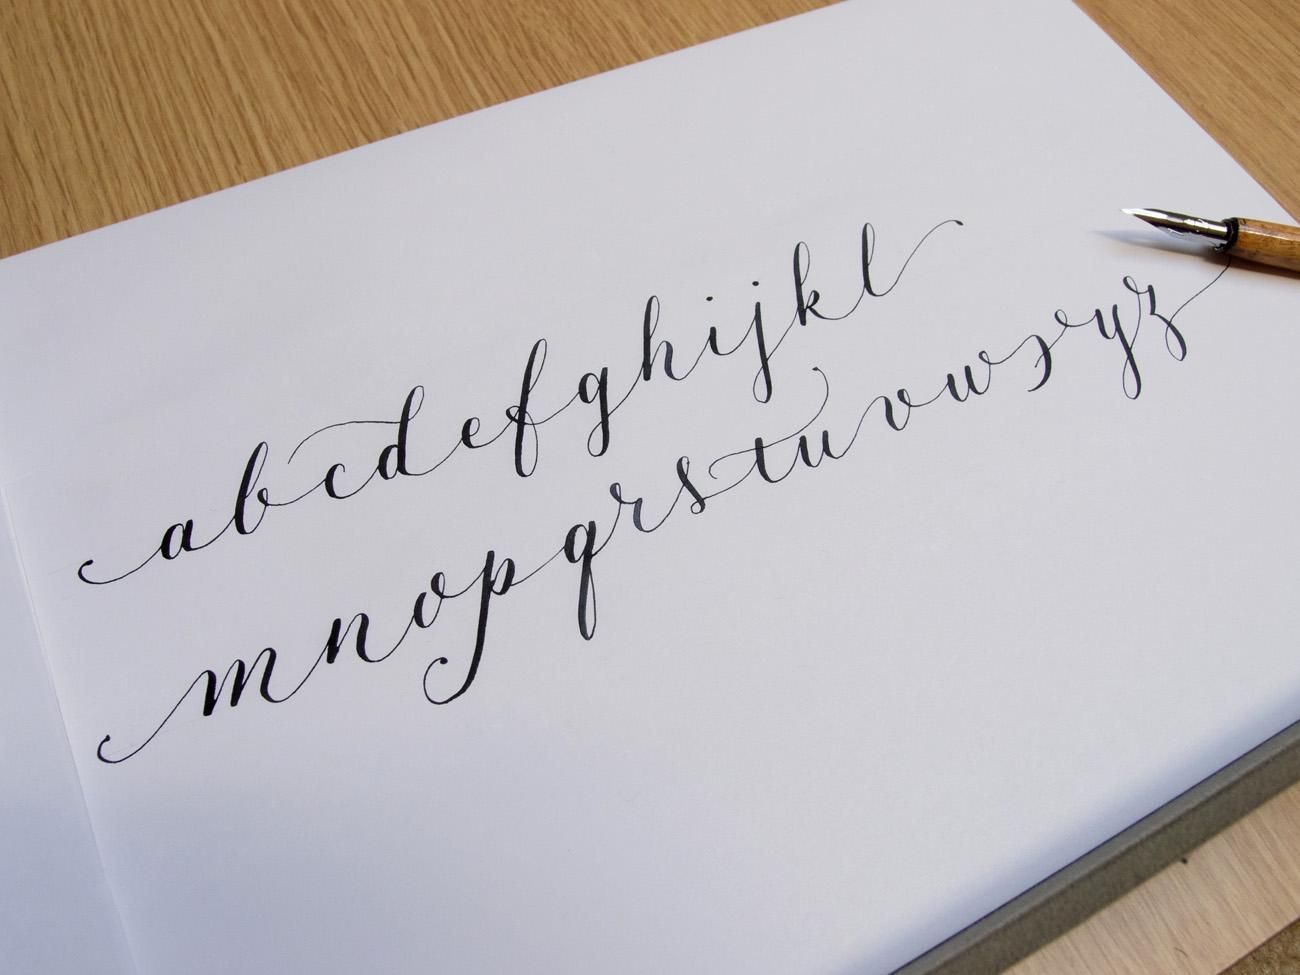 Calligraphy practice by Maria Agra - Skillshare